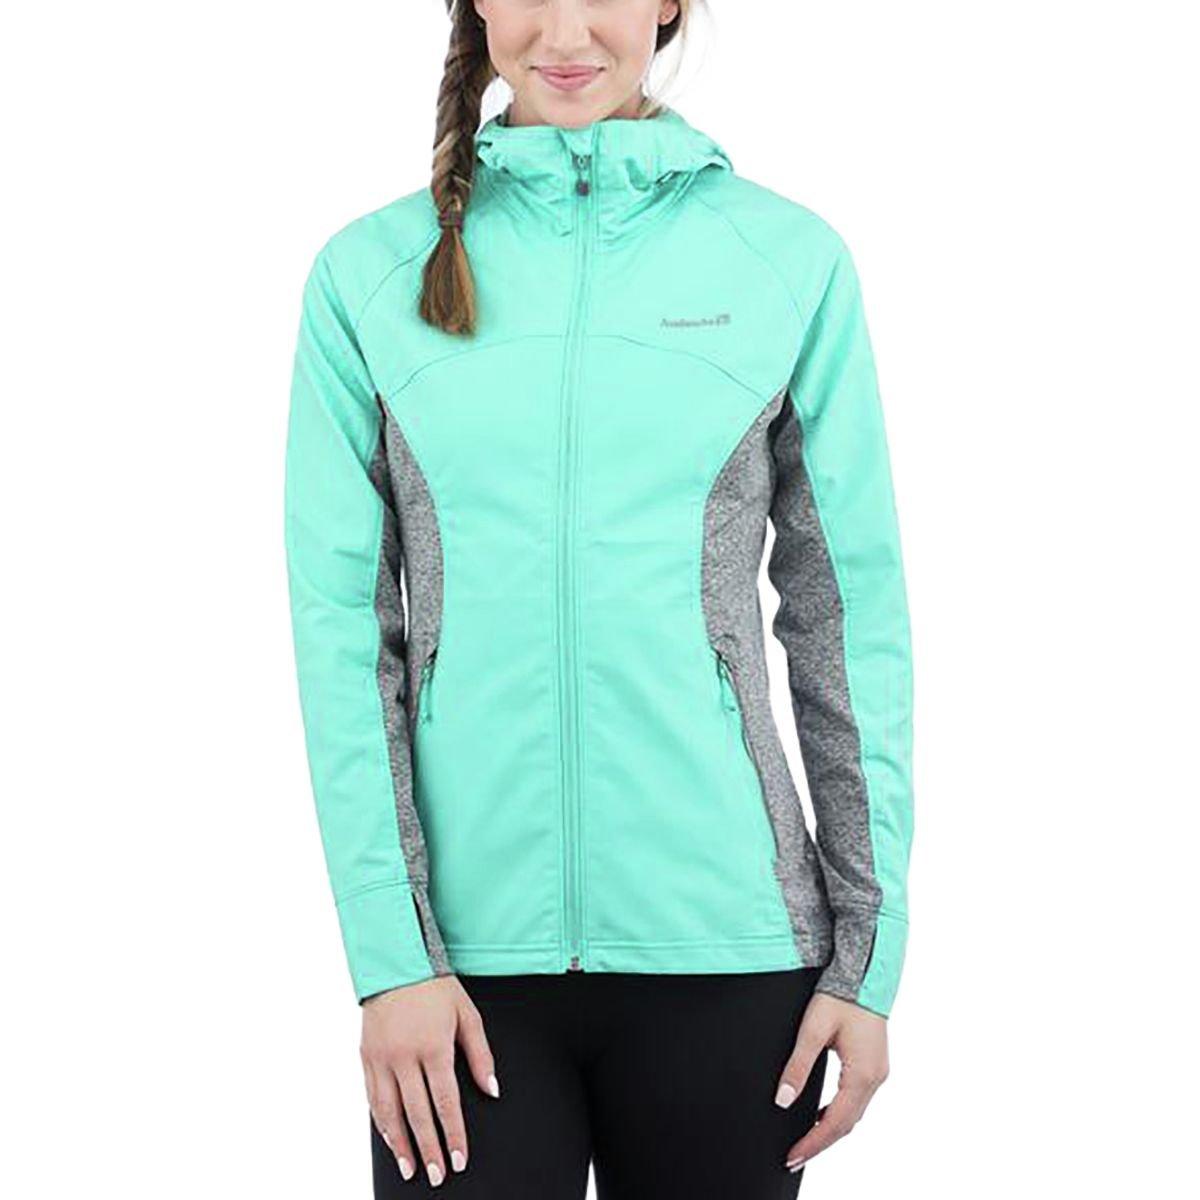 Avalanche Briza Hybrid Jacket - Women's Sea Glass, L